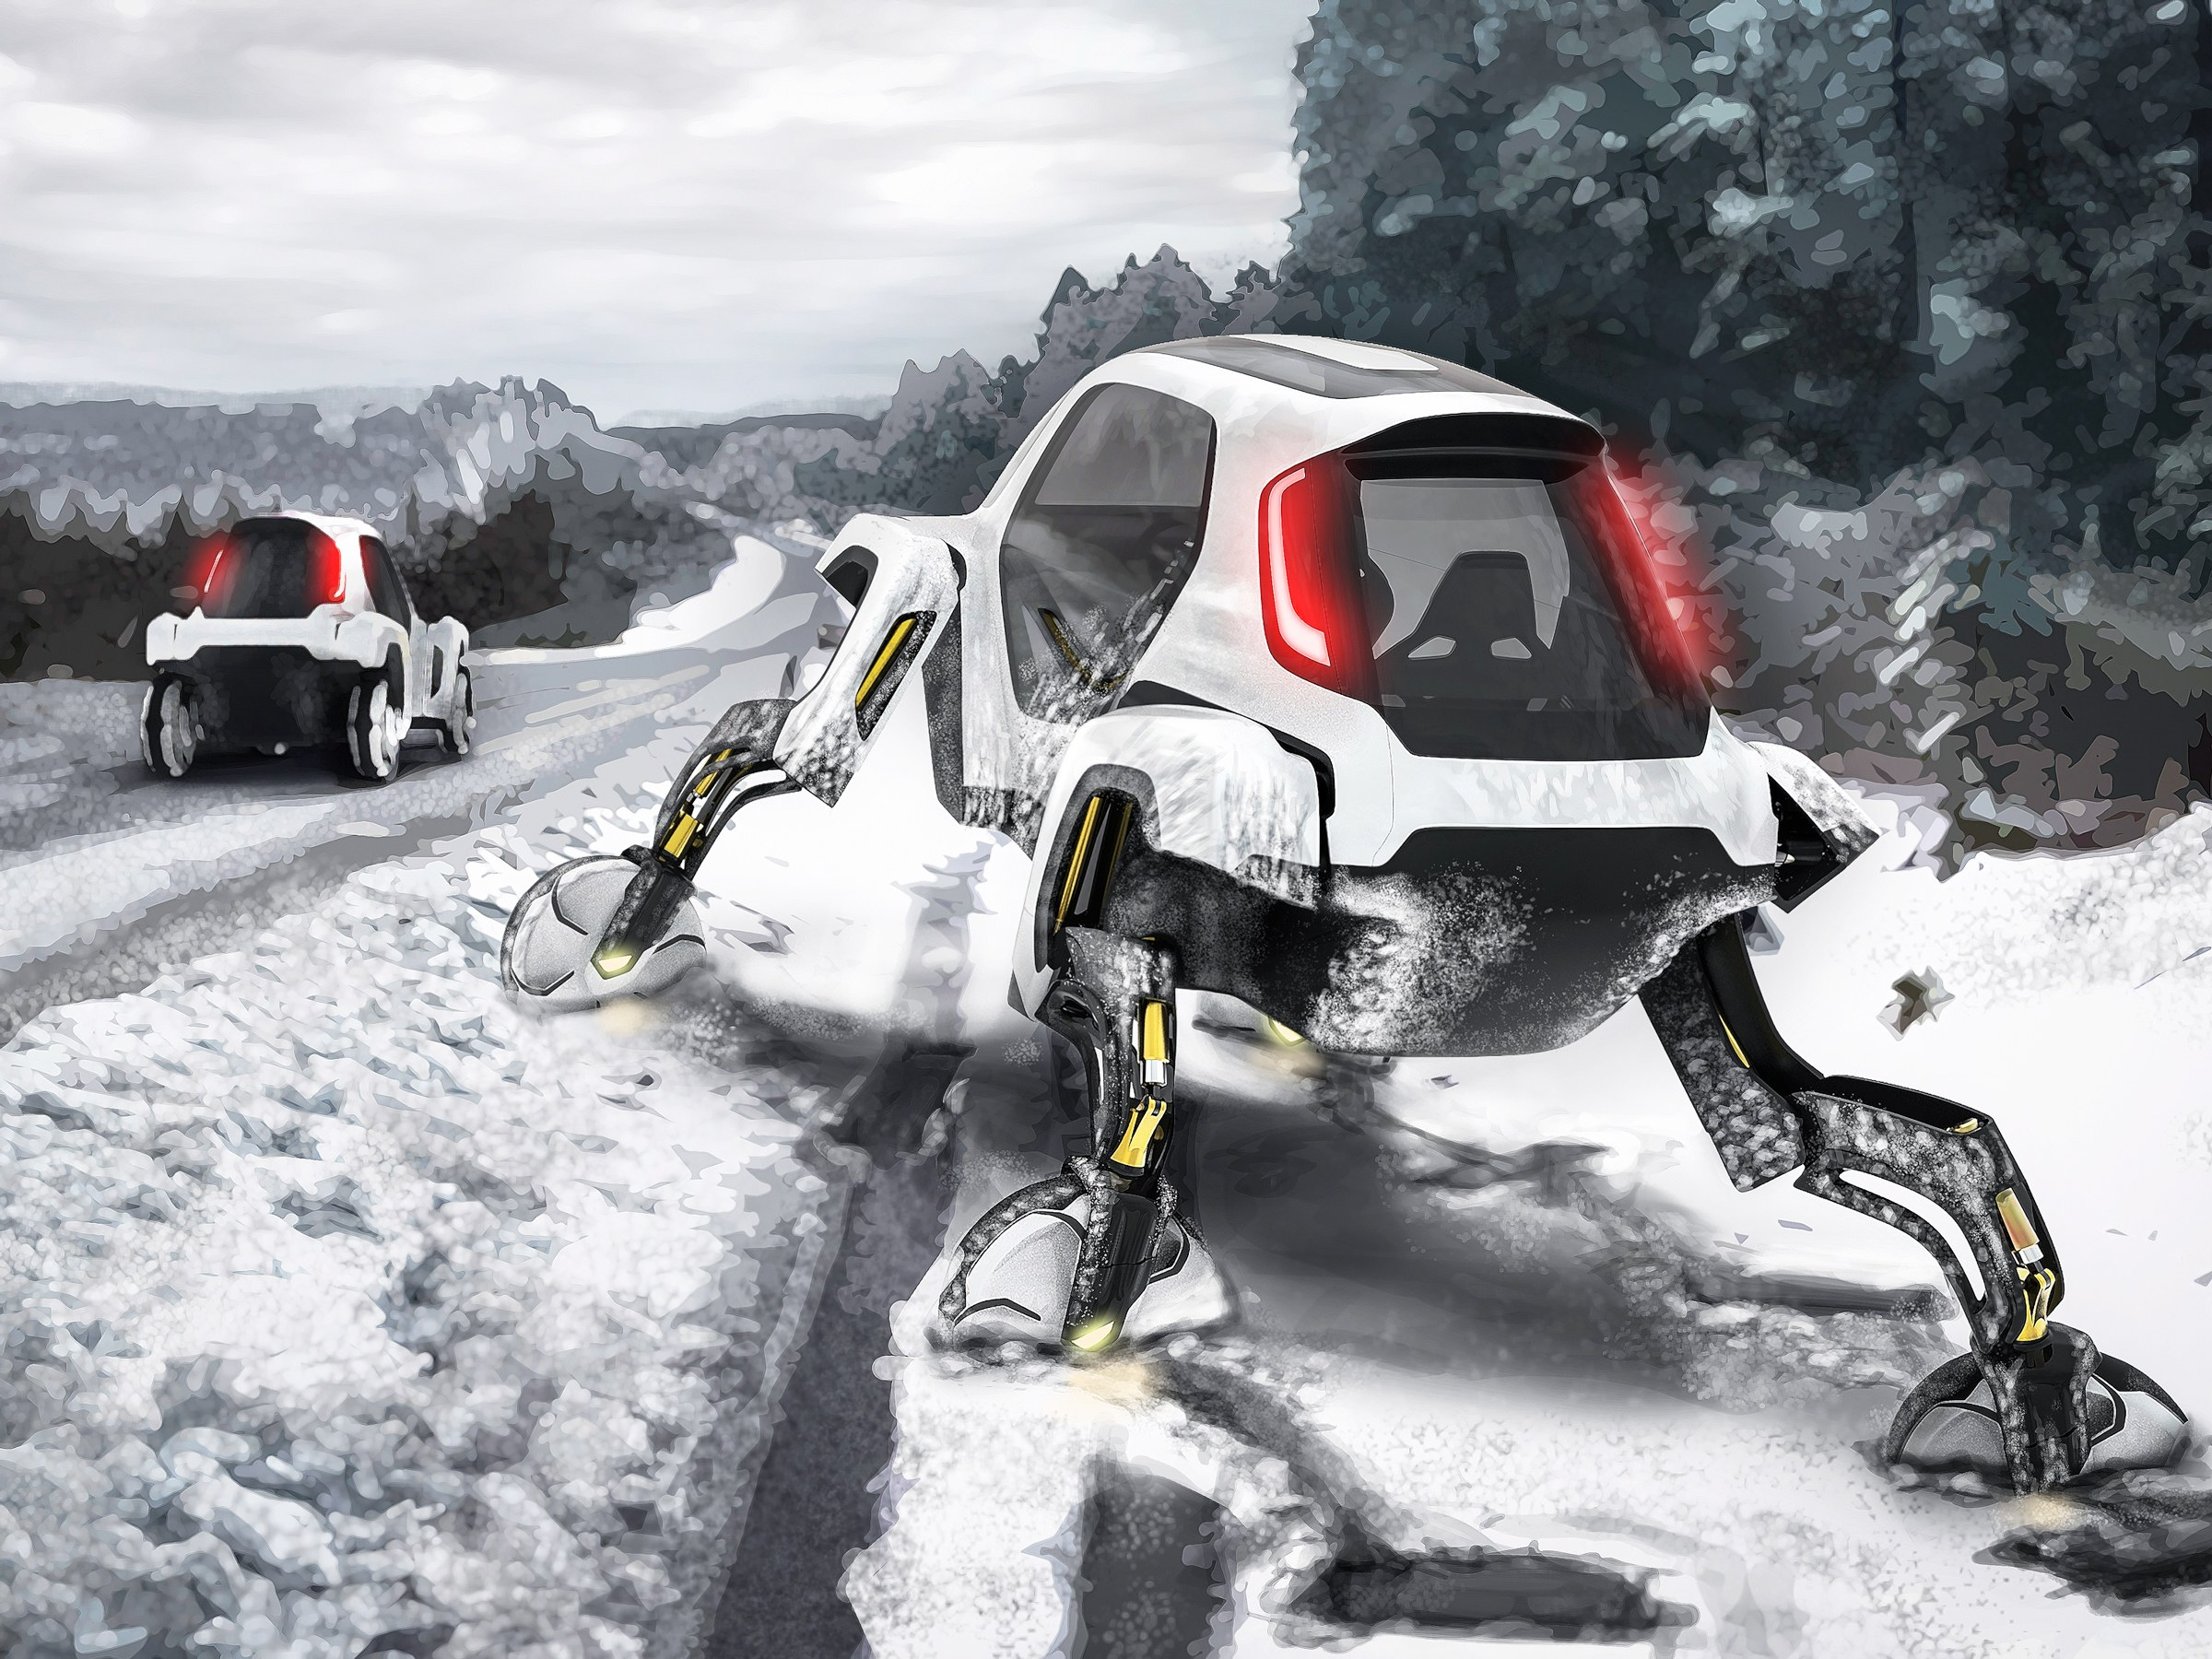 elevate-mobil-evakuasi-rancangan-hyundai-berkaki-robot